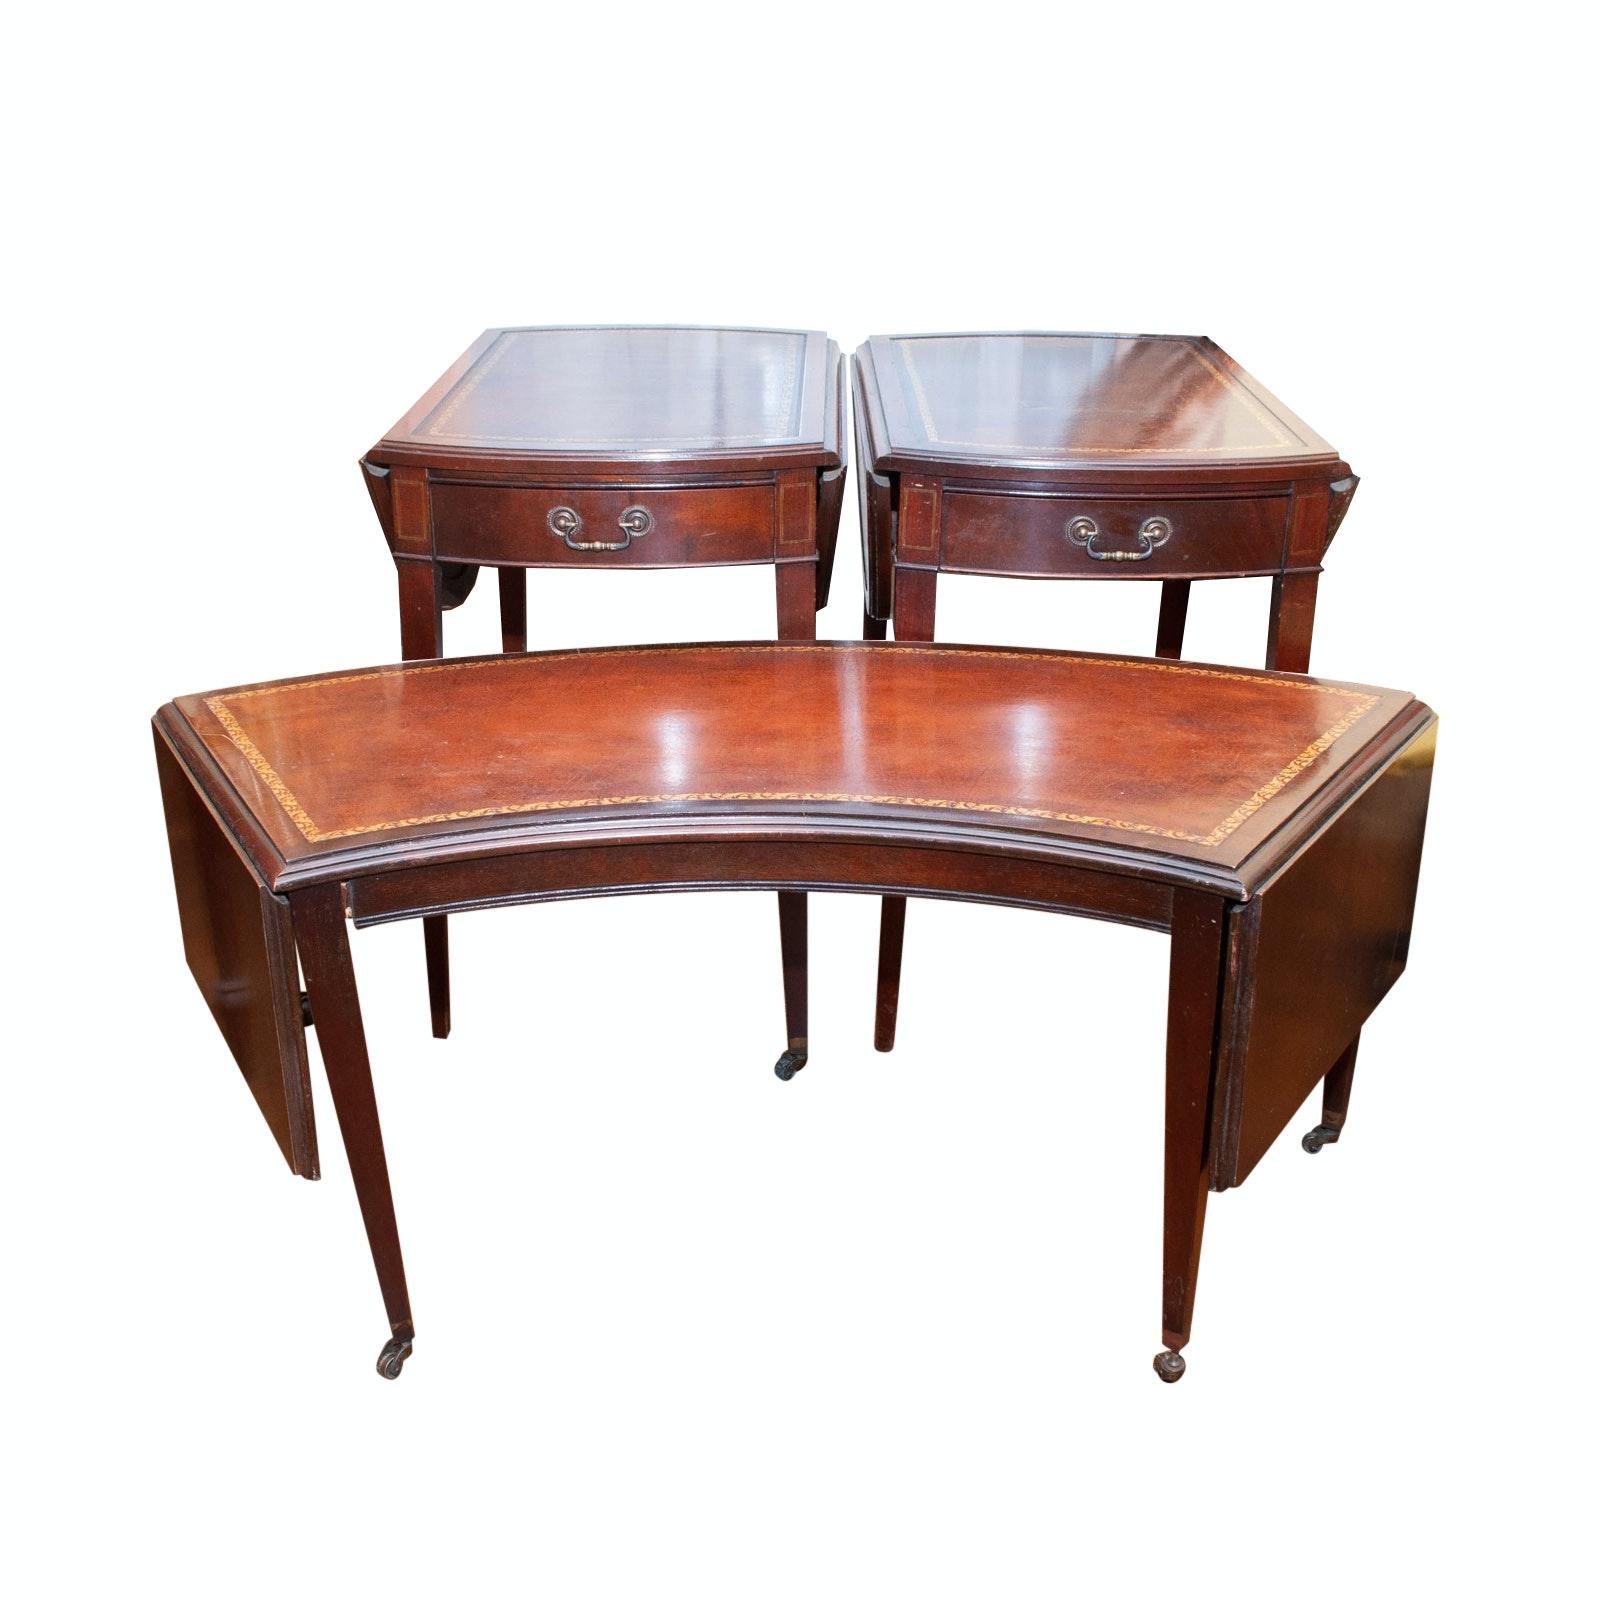 Ferguson Bros. Wrap-Around Coffee Table & Two Drop Leaf Tables